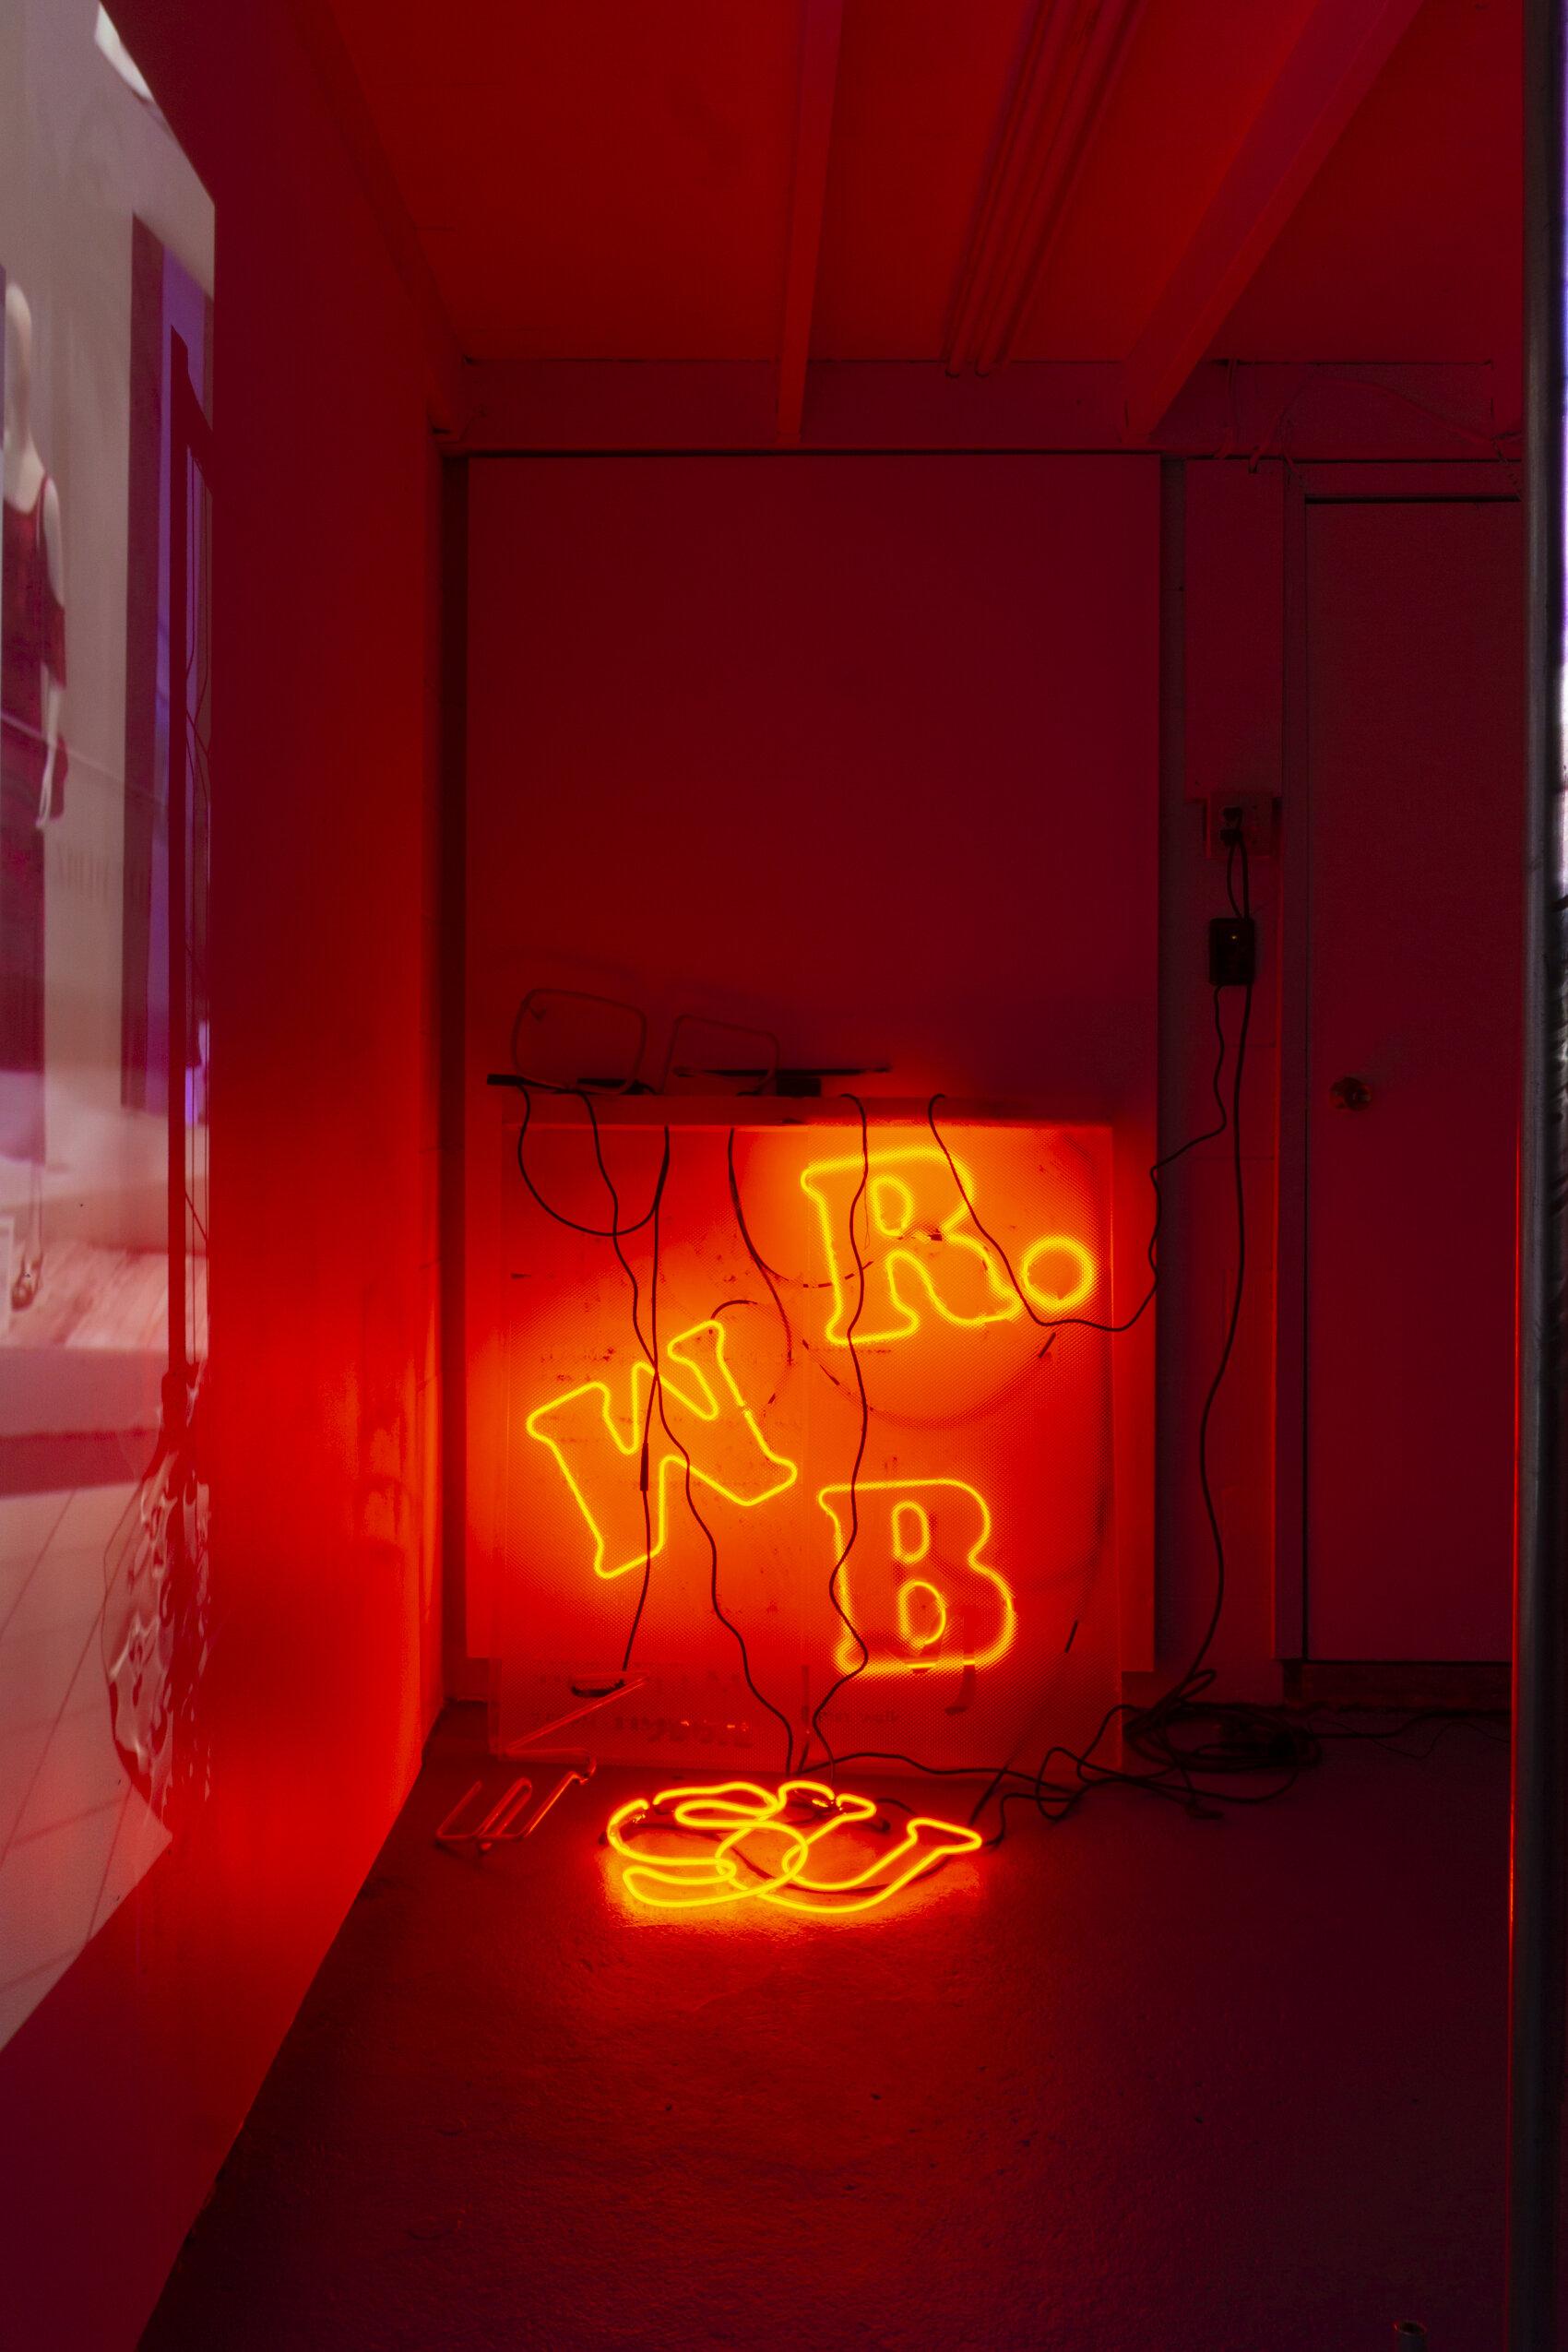 Sophia Oppel,  Mr. Sub , 2019, Neon, acrylic.